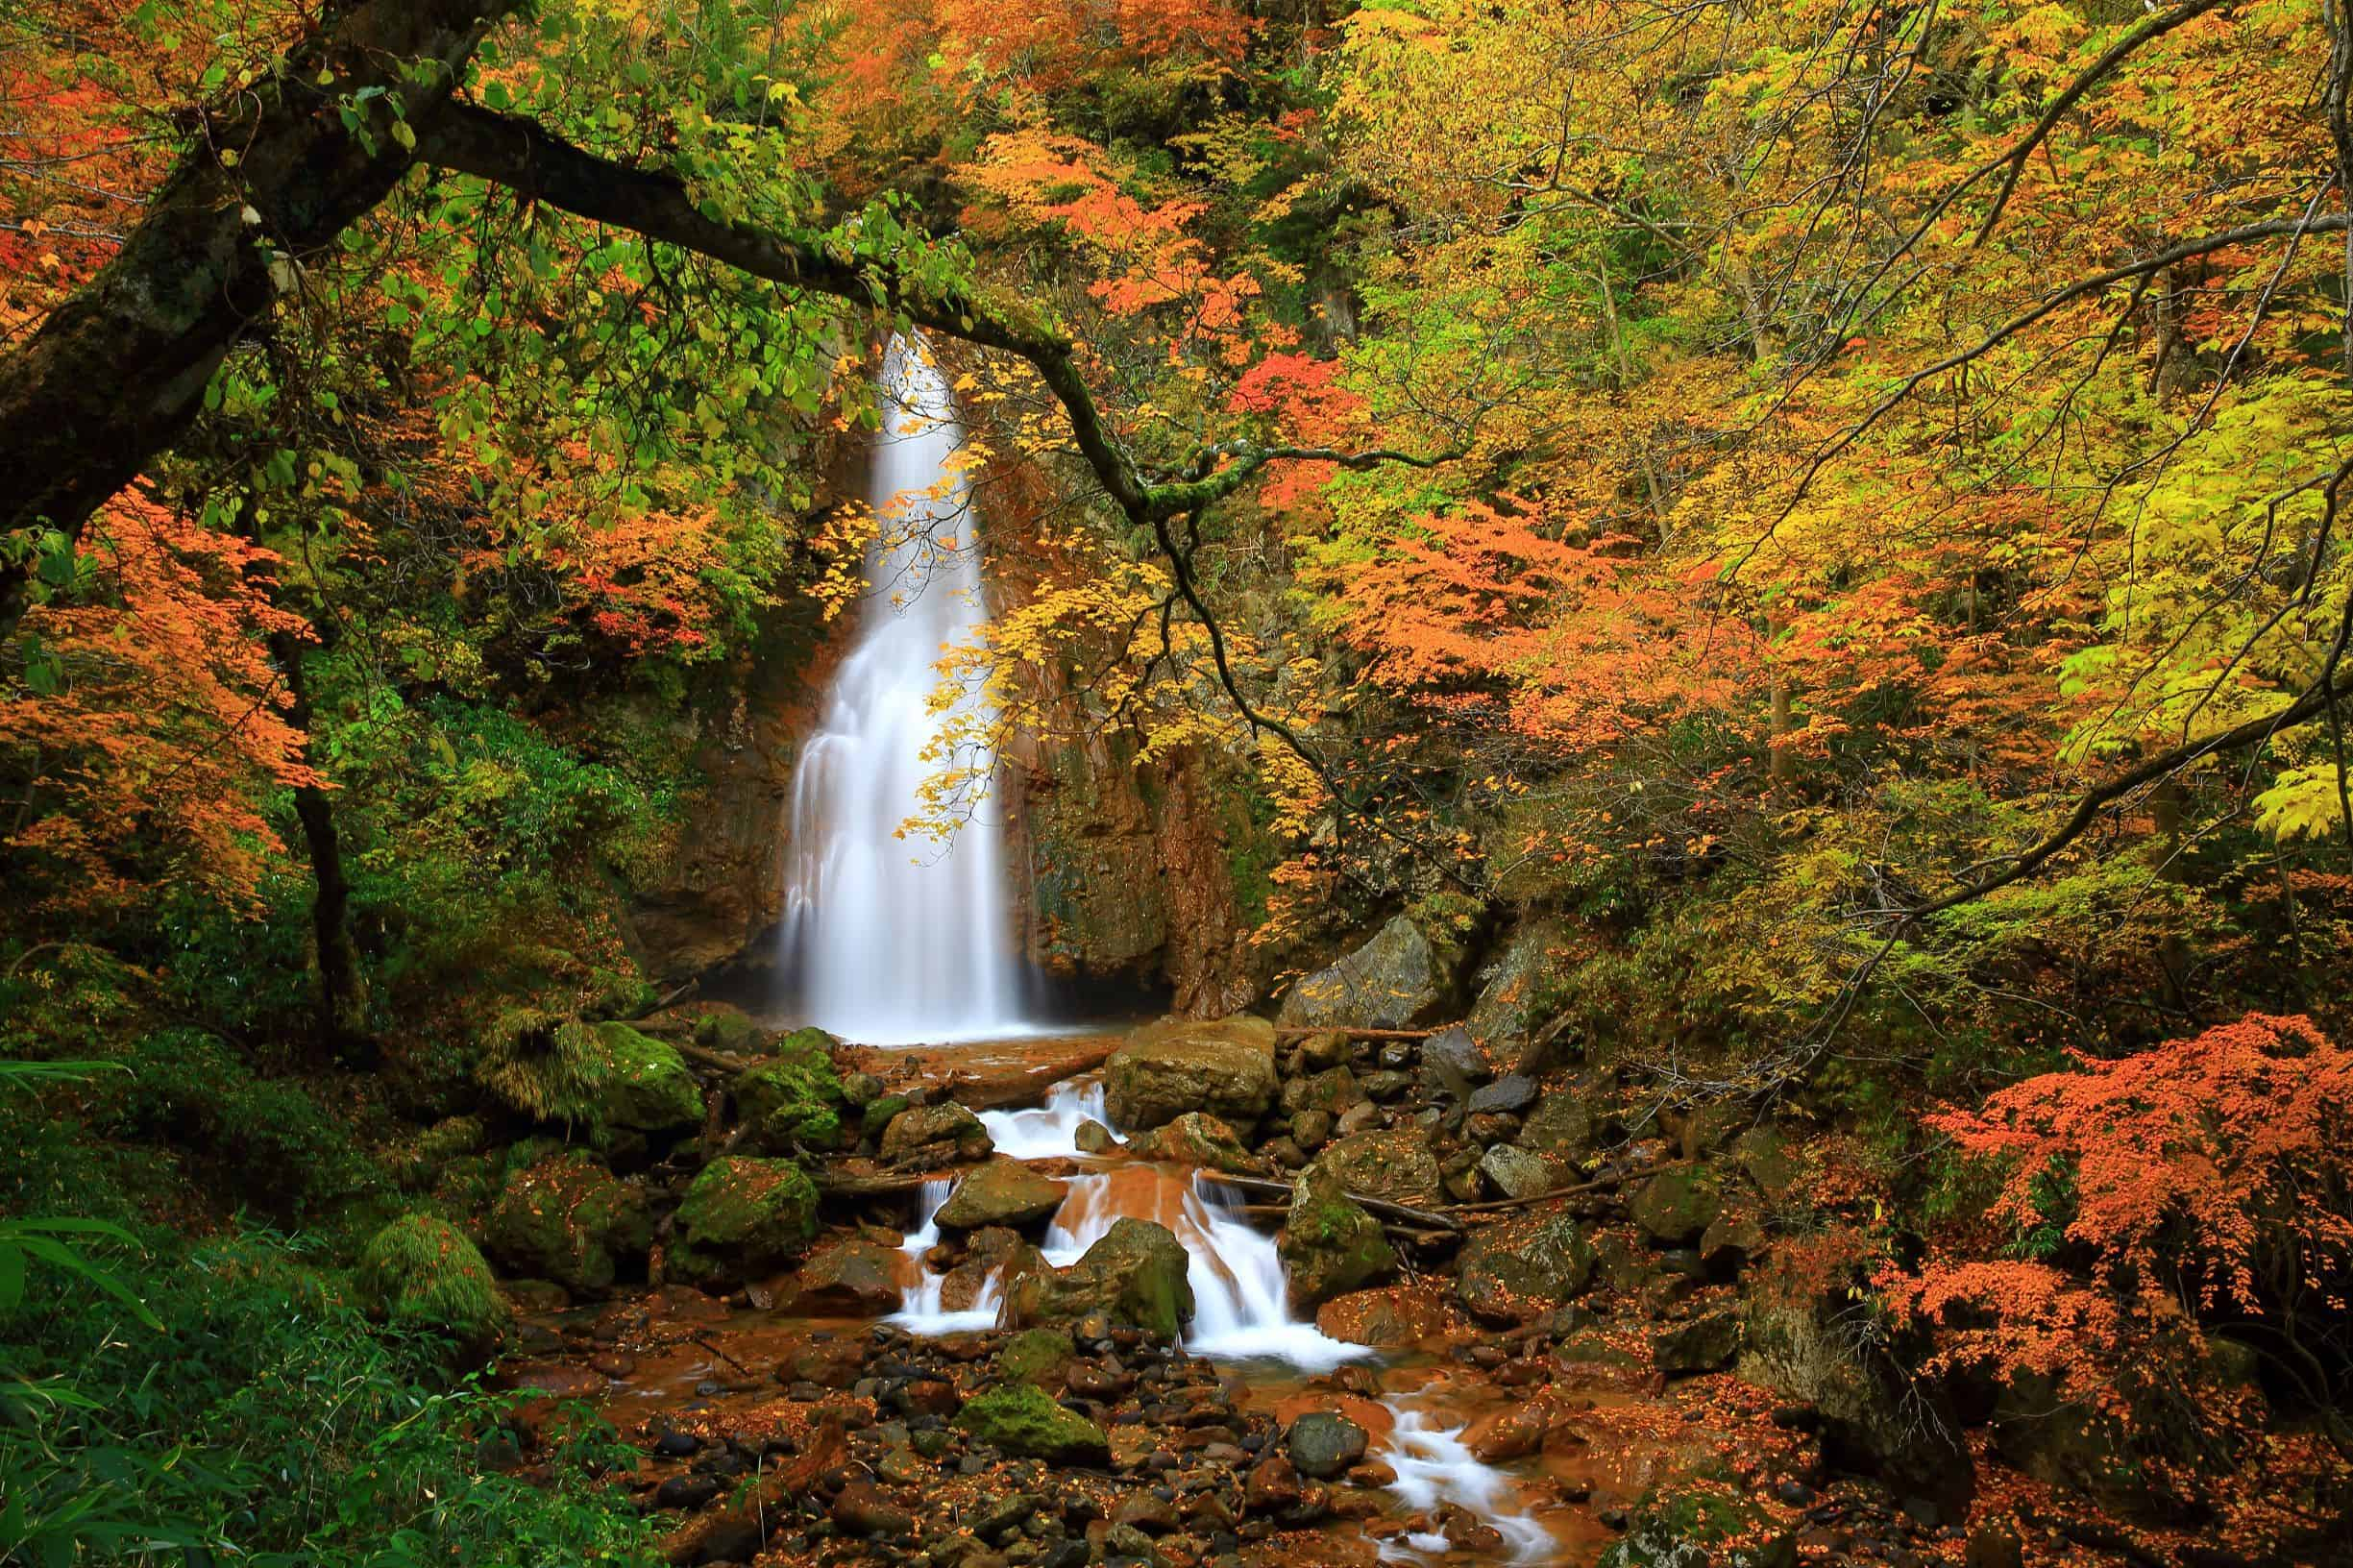 Towada-Hachimantai National Park